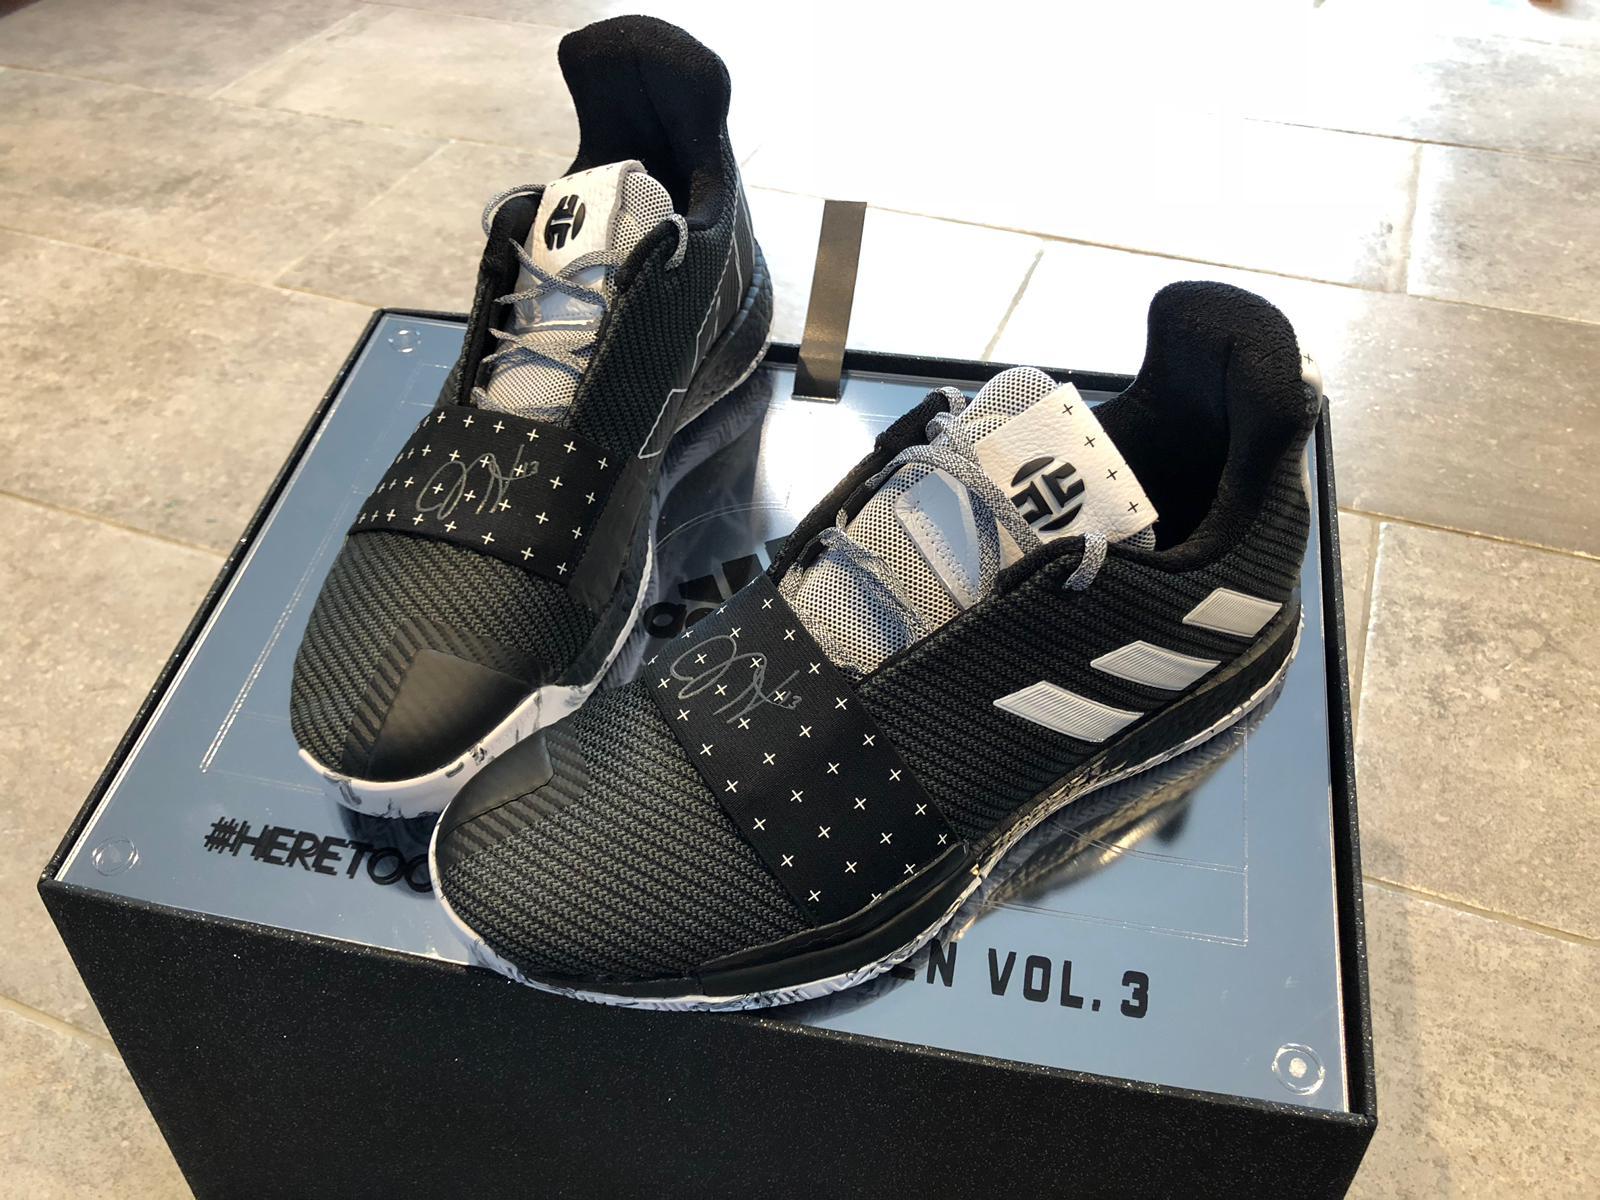 Le 3 Test Vol Adidas Kicks Des Harden vOTOAq